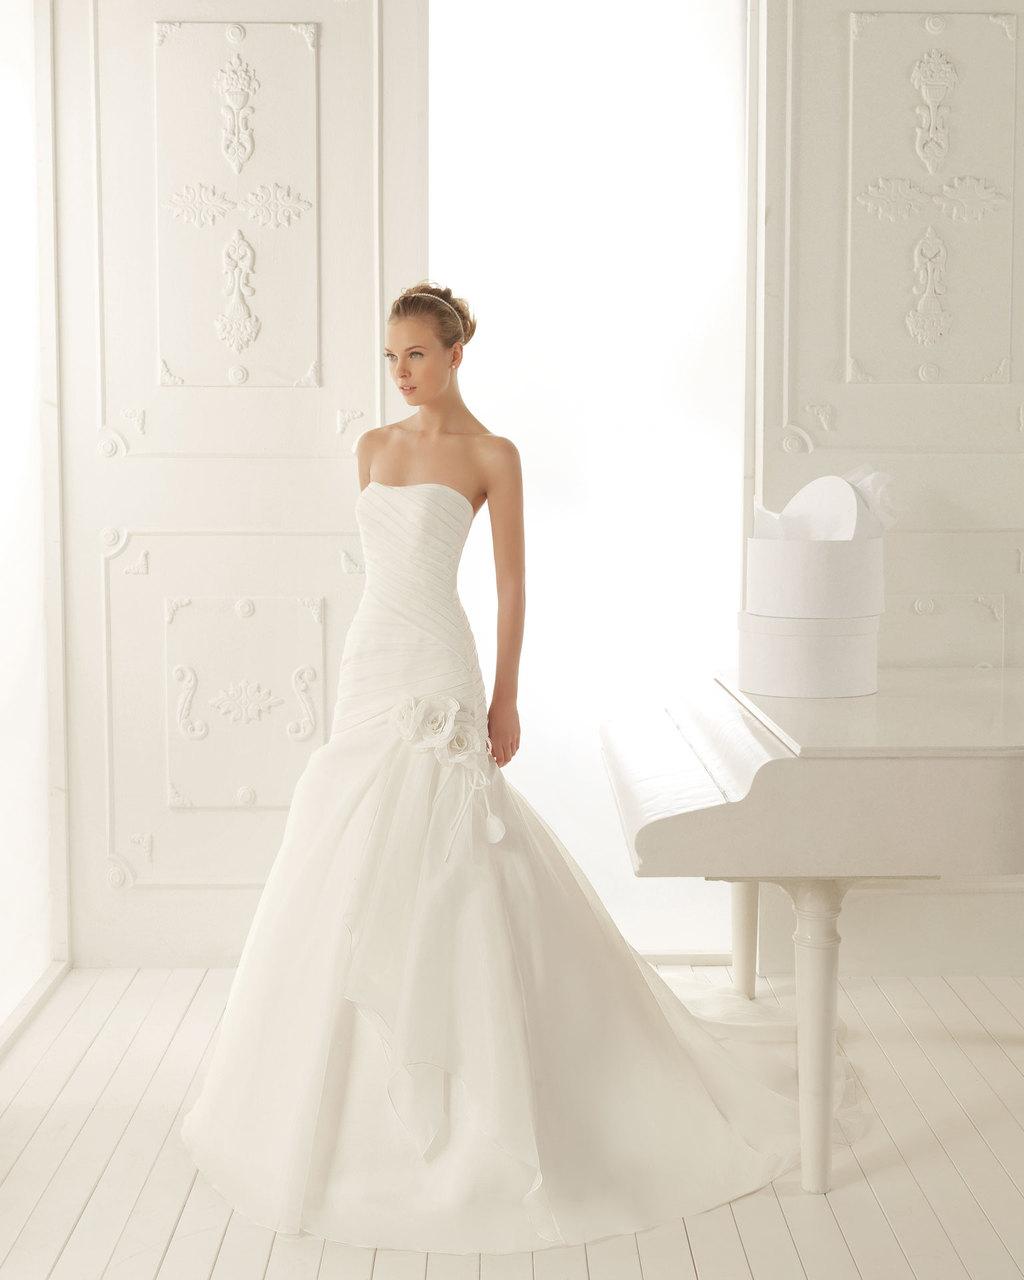 Aire-barcelona-wedding-dress-2013-vintage-bridal-collection-velasquez.full